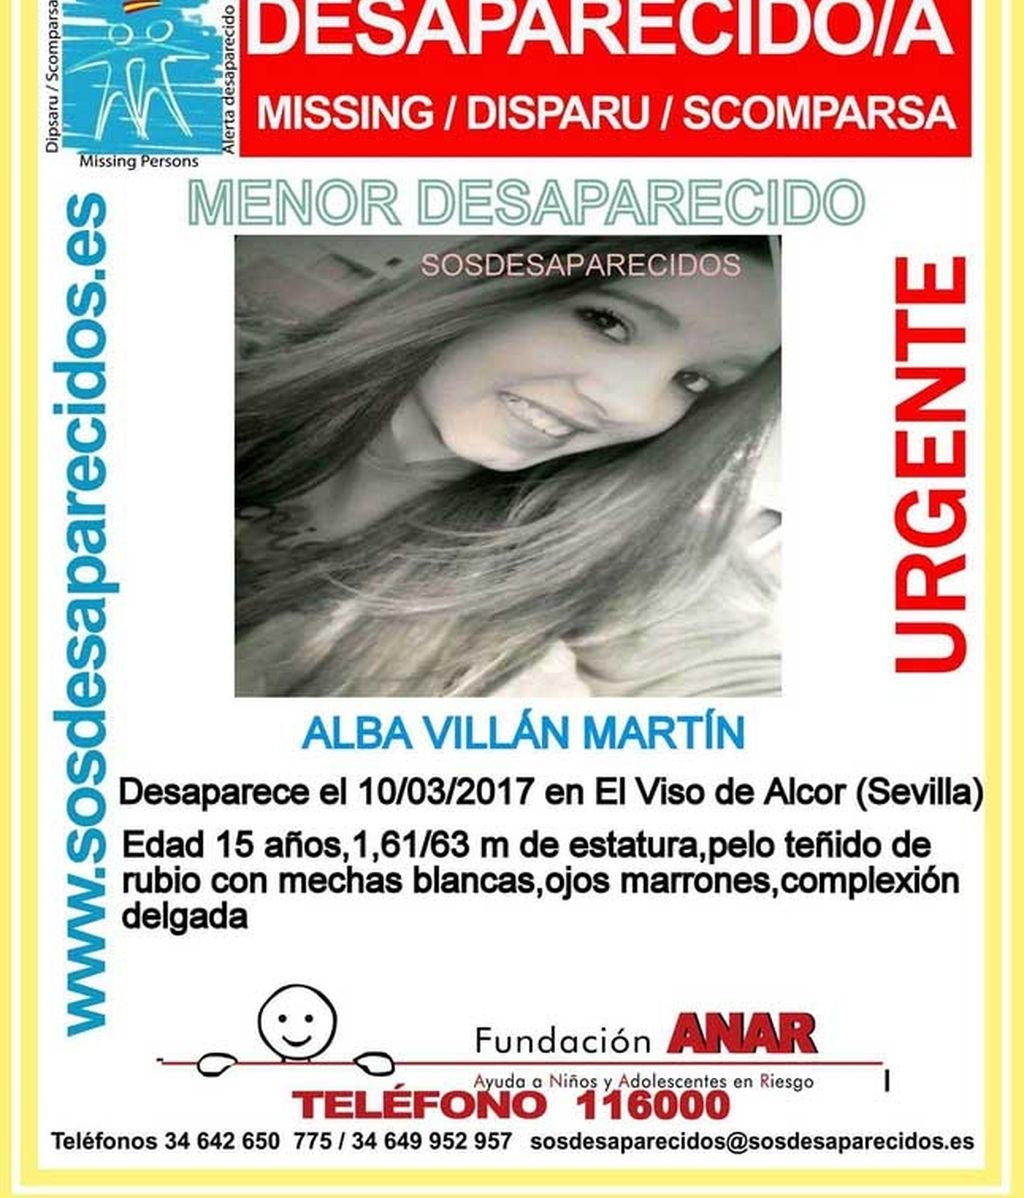 Alba Villán Martín, desaparecida